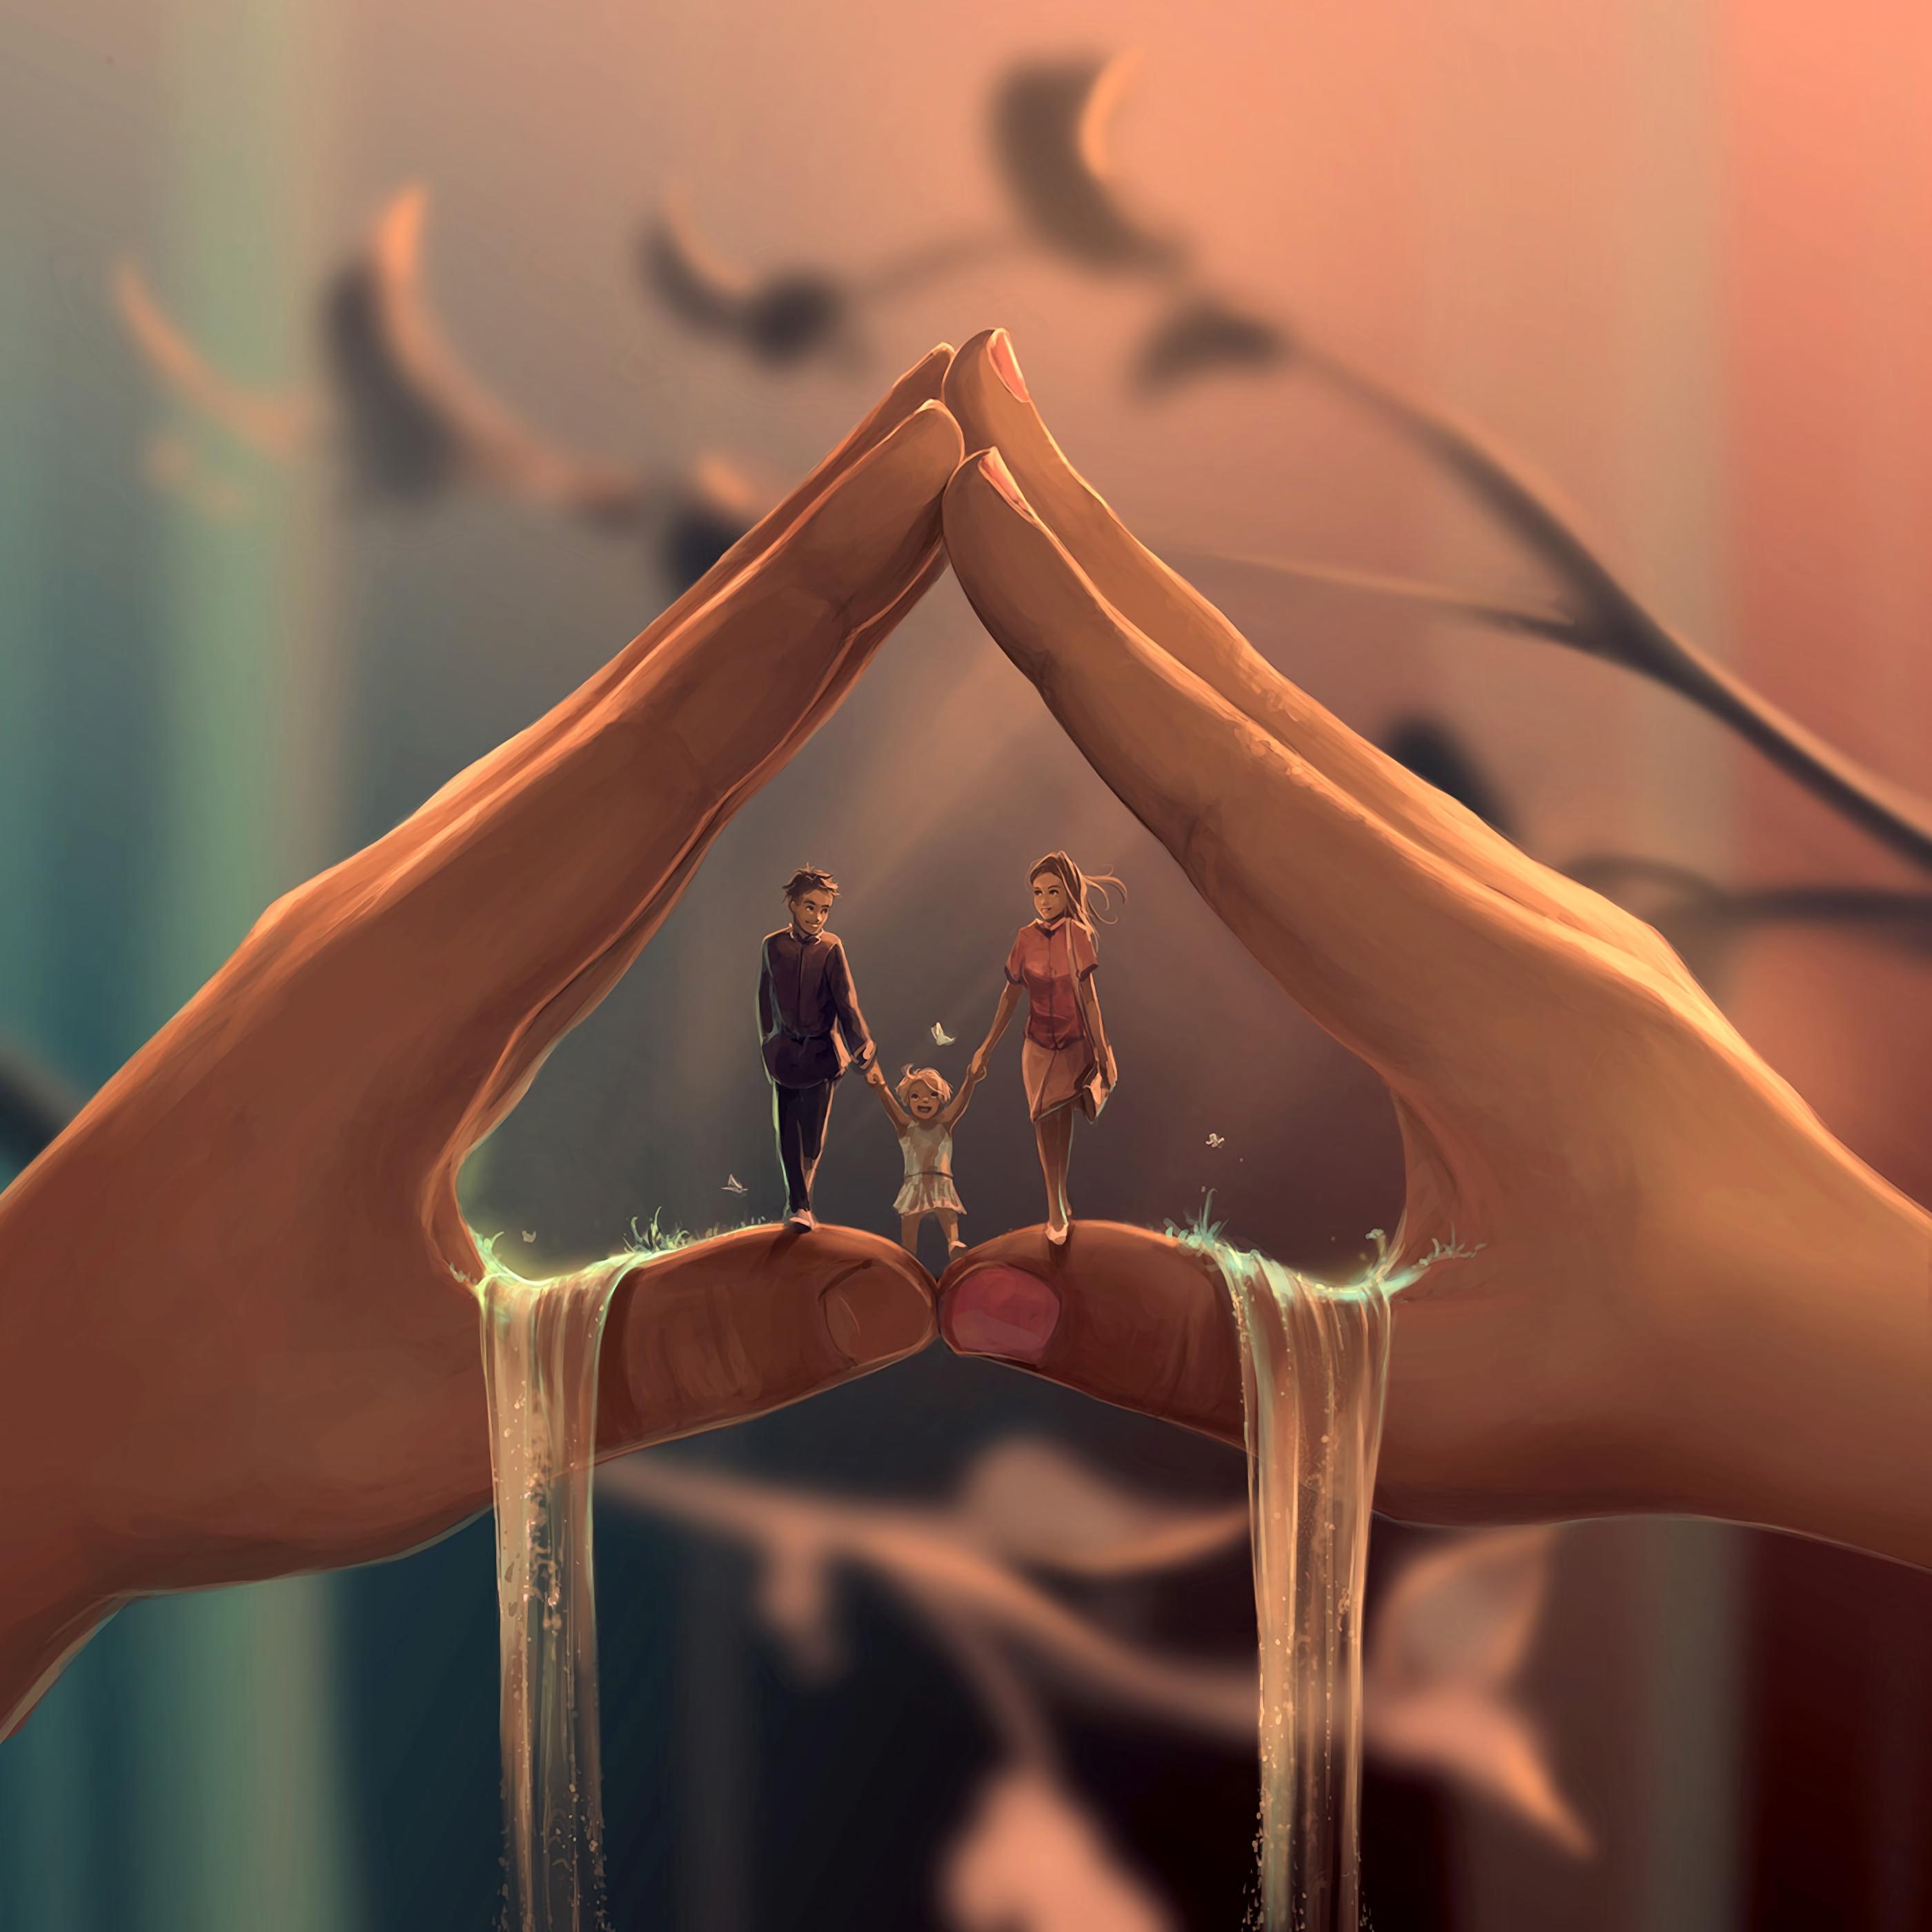 Wallpaper Family, Parents, Child, Happiness, Love, - Cyril Rolando Art - HD Wallpaper